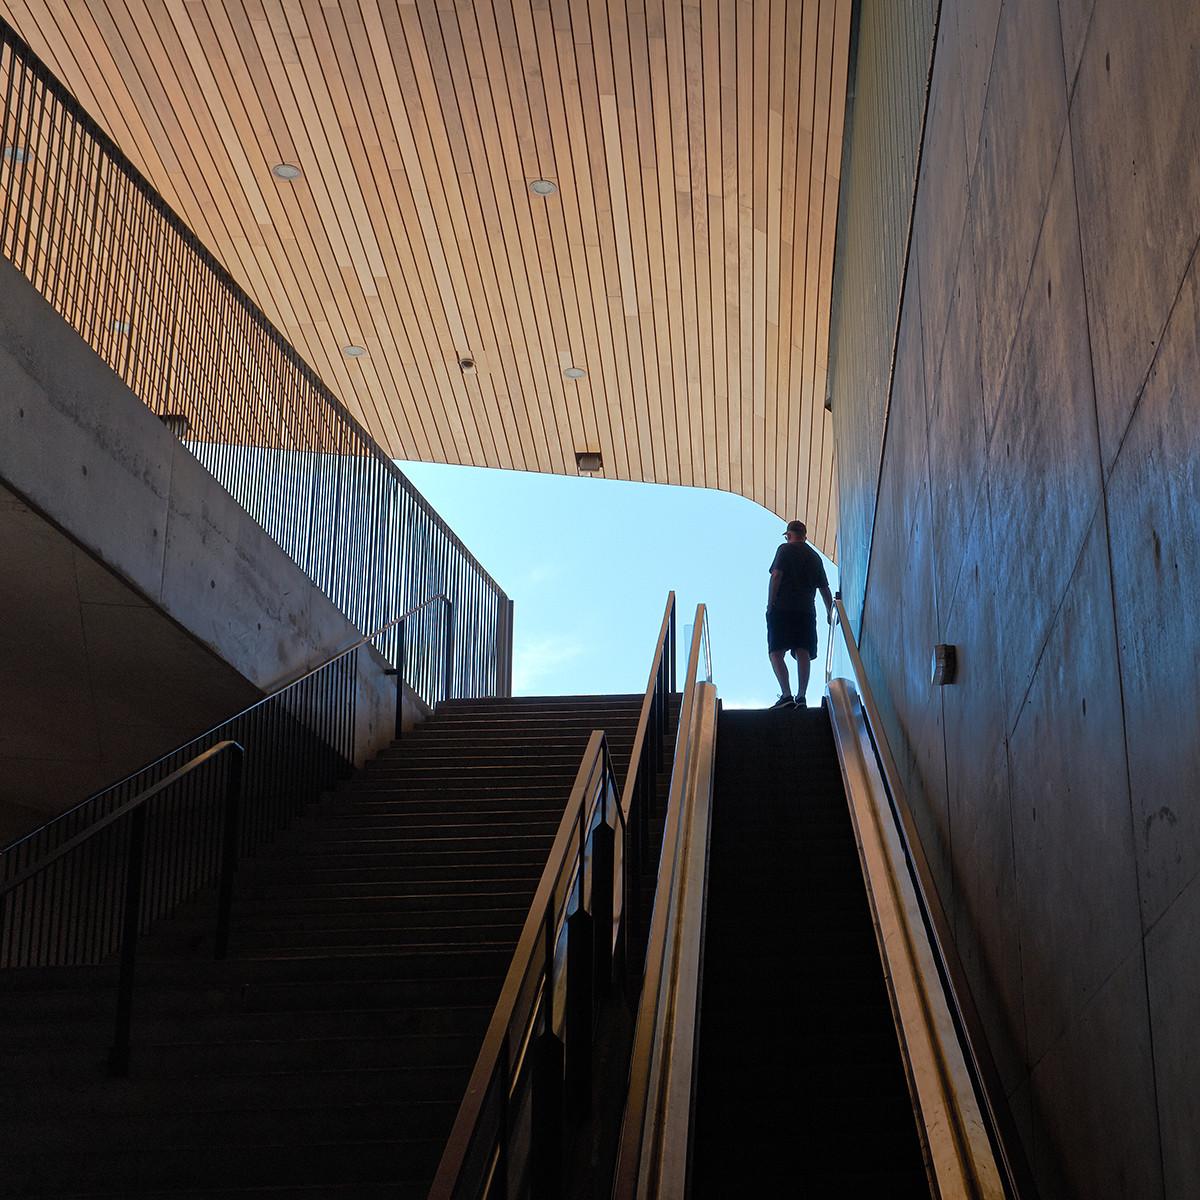 COLOUR - Escalate by Damian McDonald (9 marks)